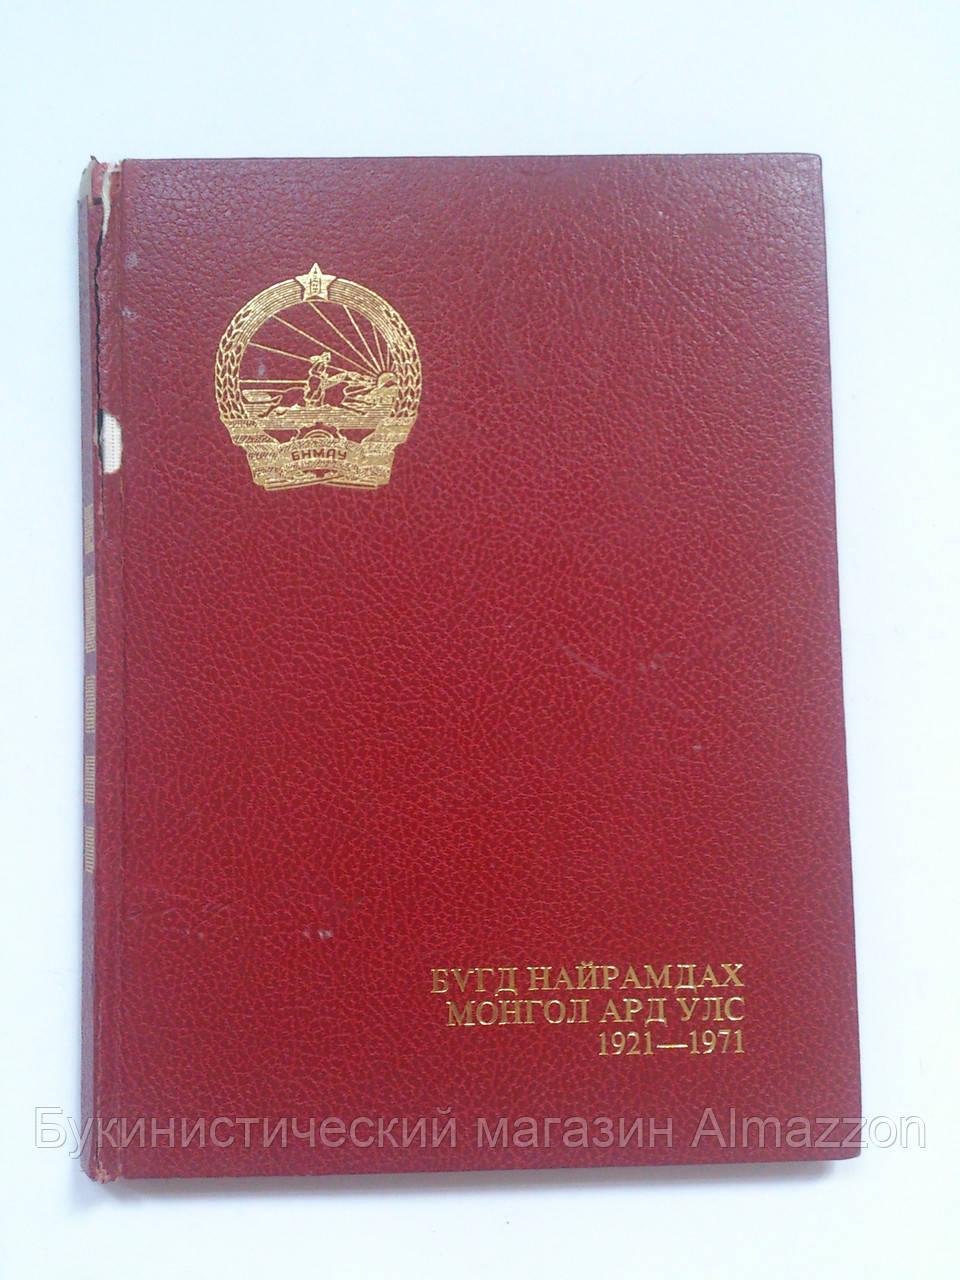 Монгольская Народная Республика 1971 год Бугд Найрамдах Монгол Ард Улс 1921-1971